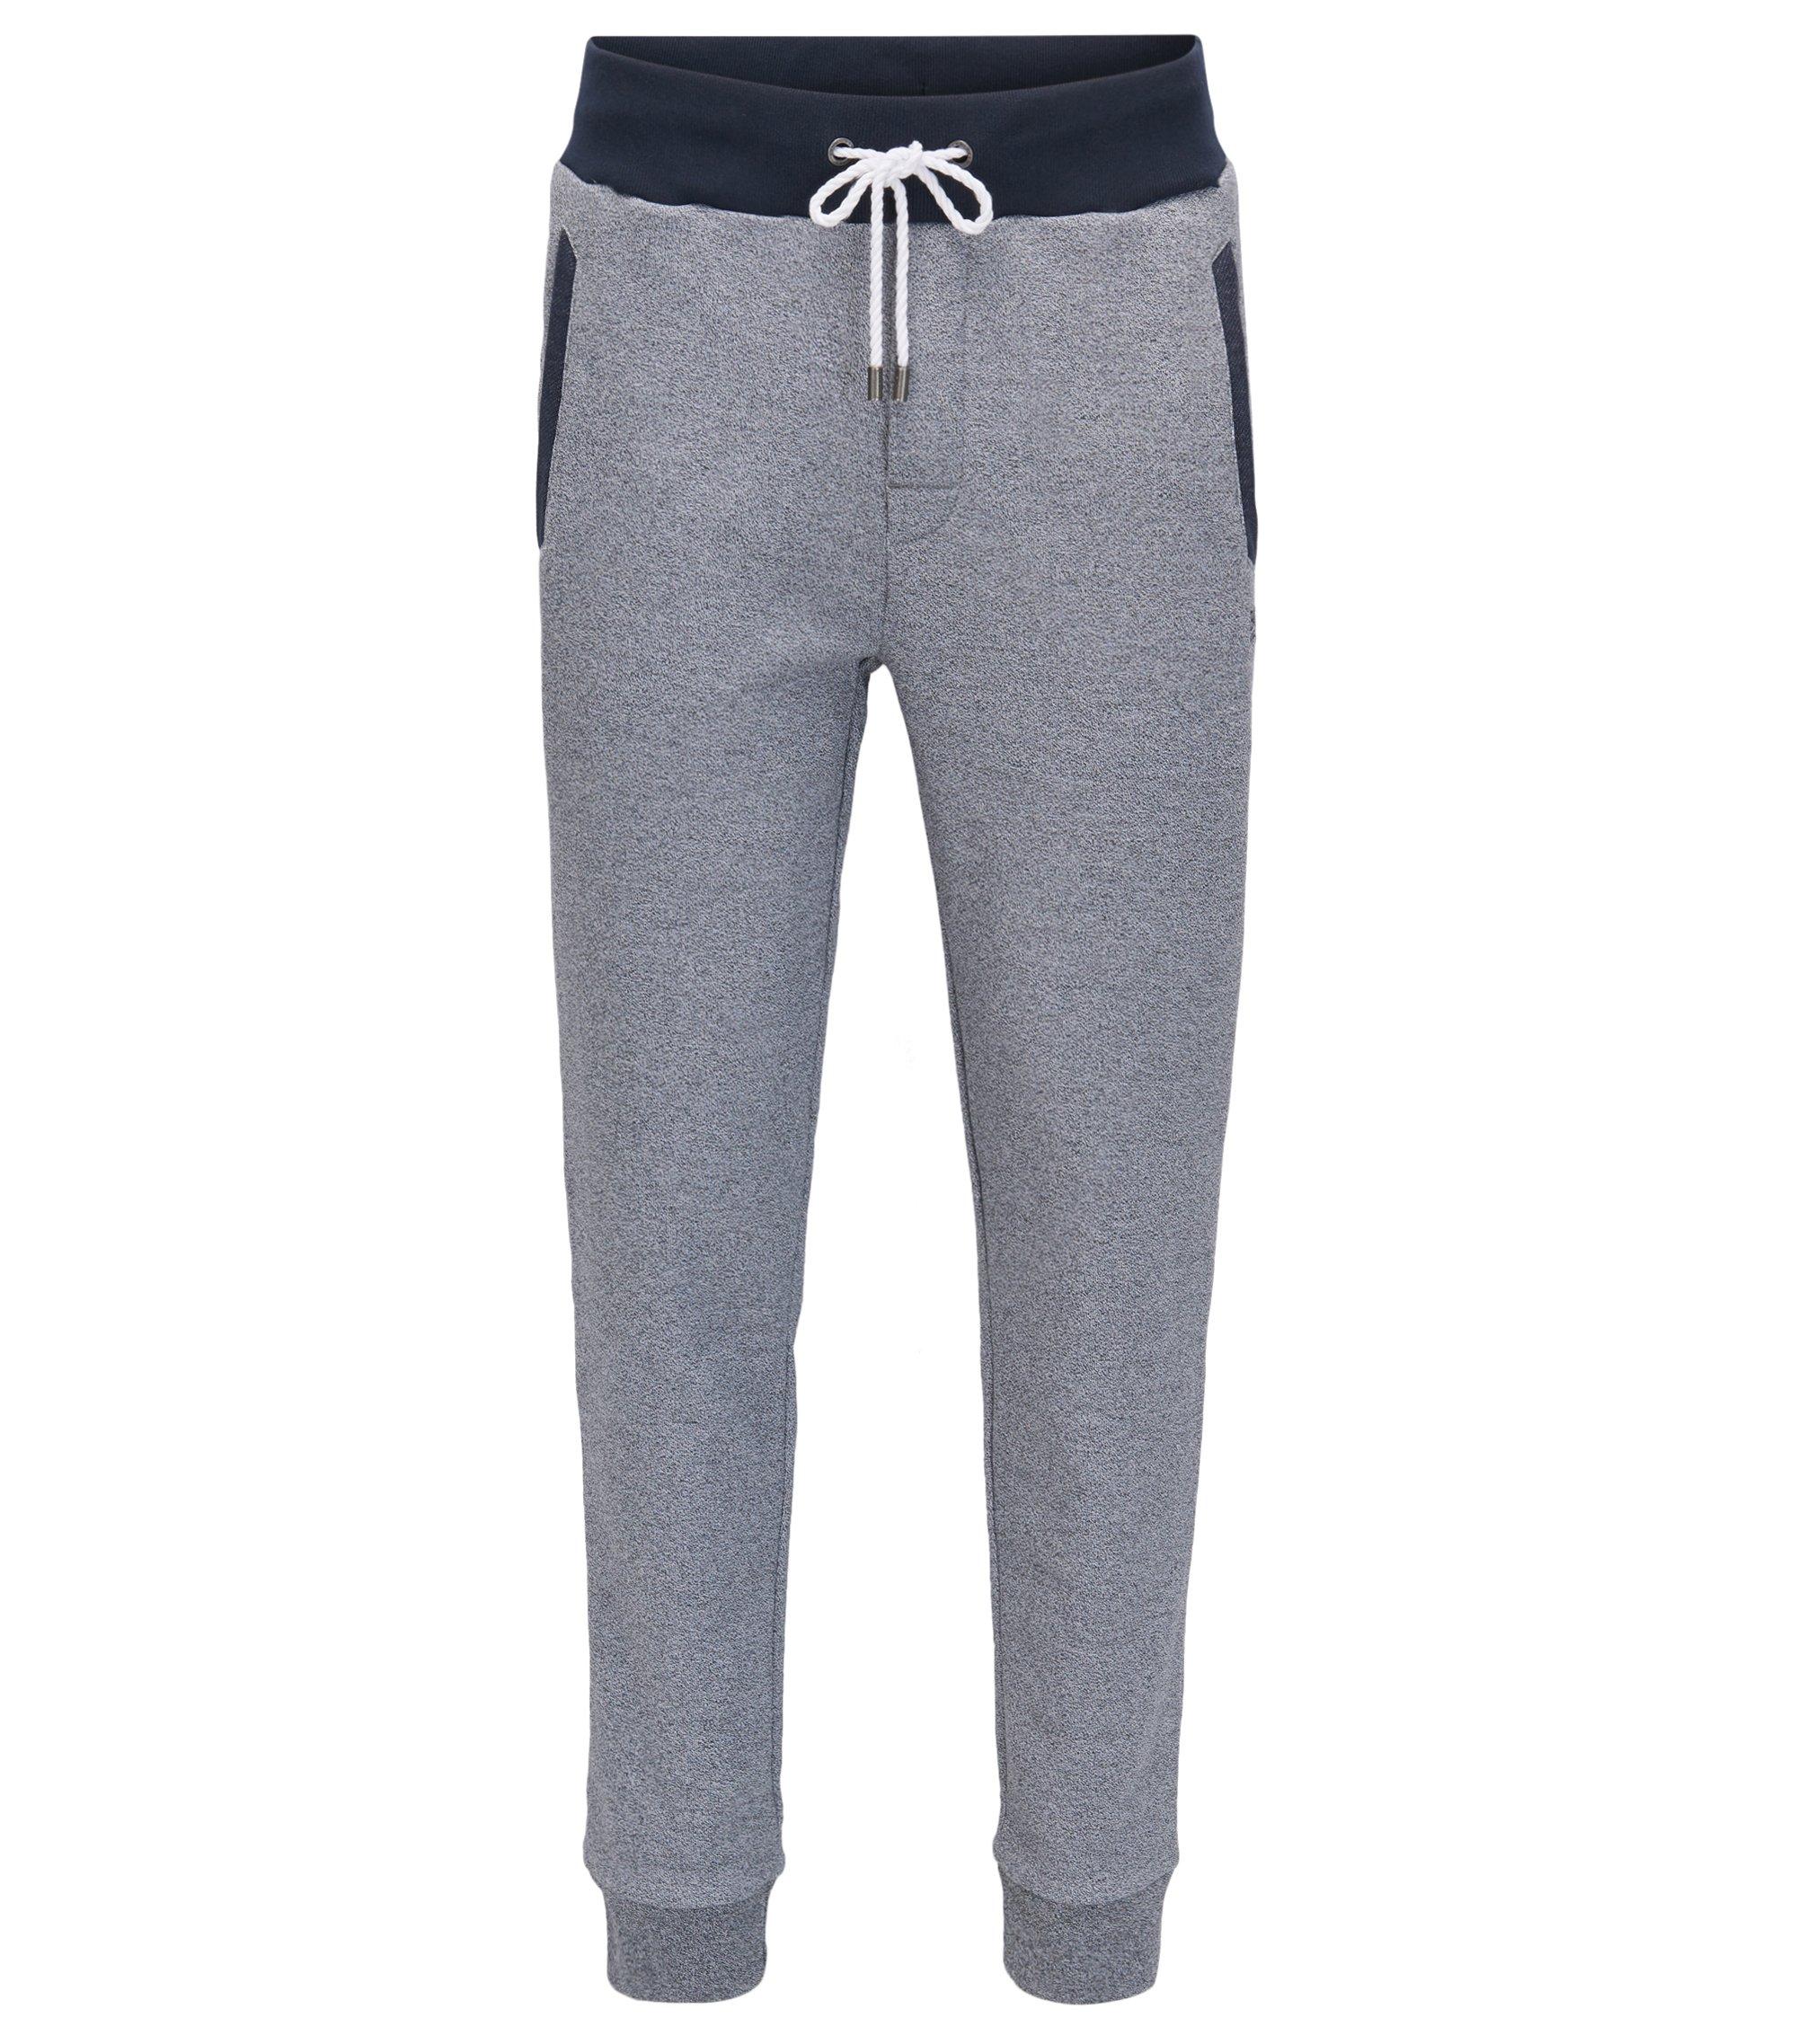 Jogginghose aus melierter Baumwolle, Grau